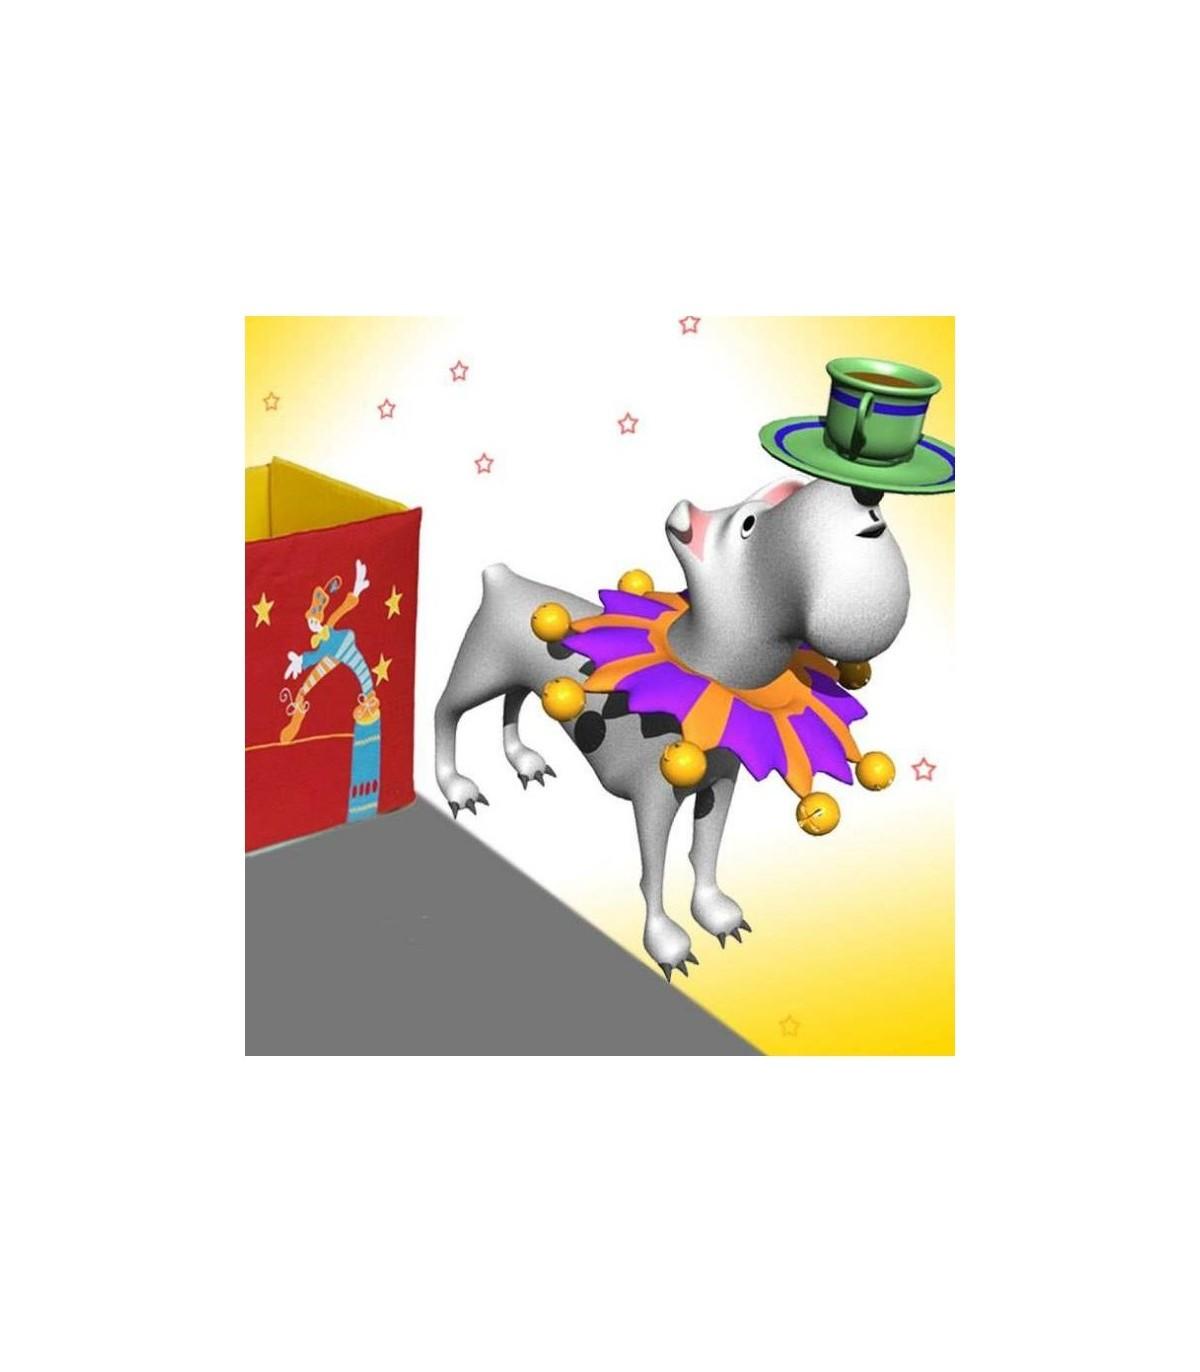 Sticker chien jongleur